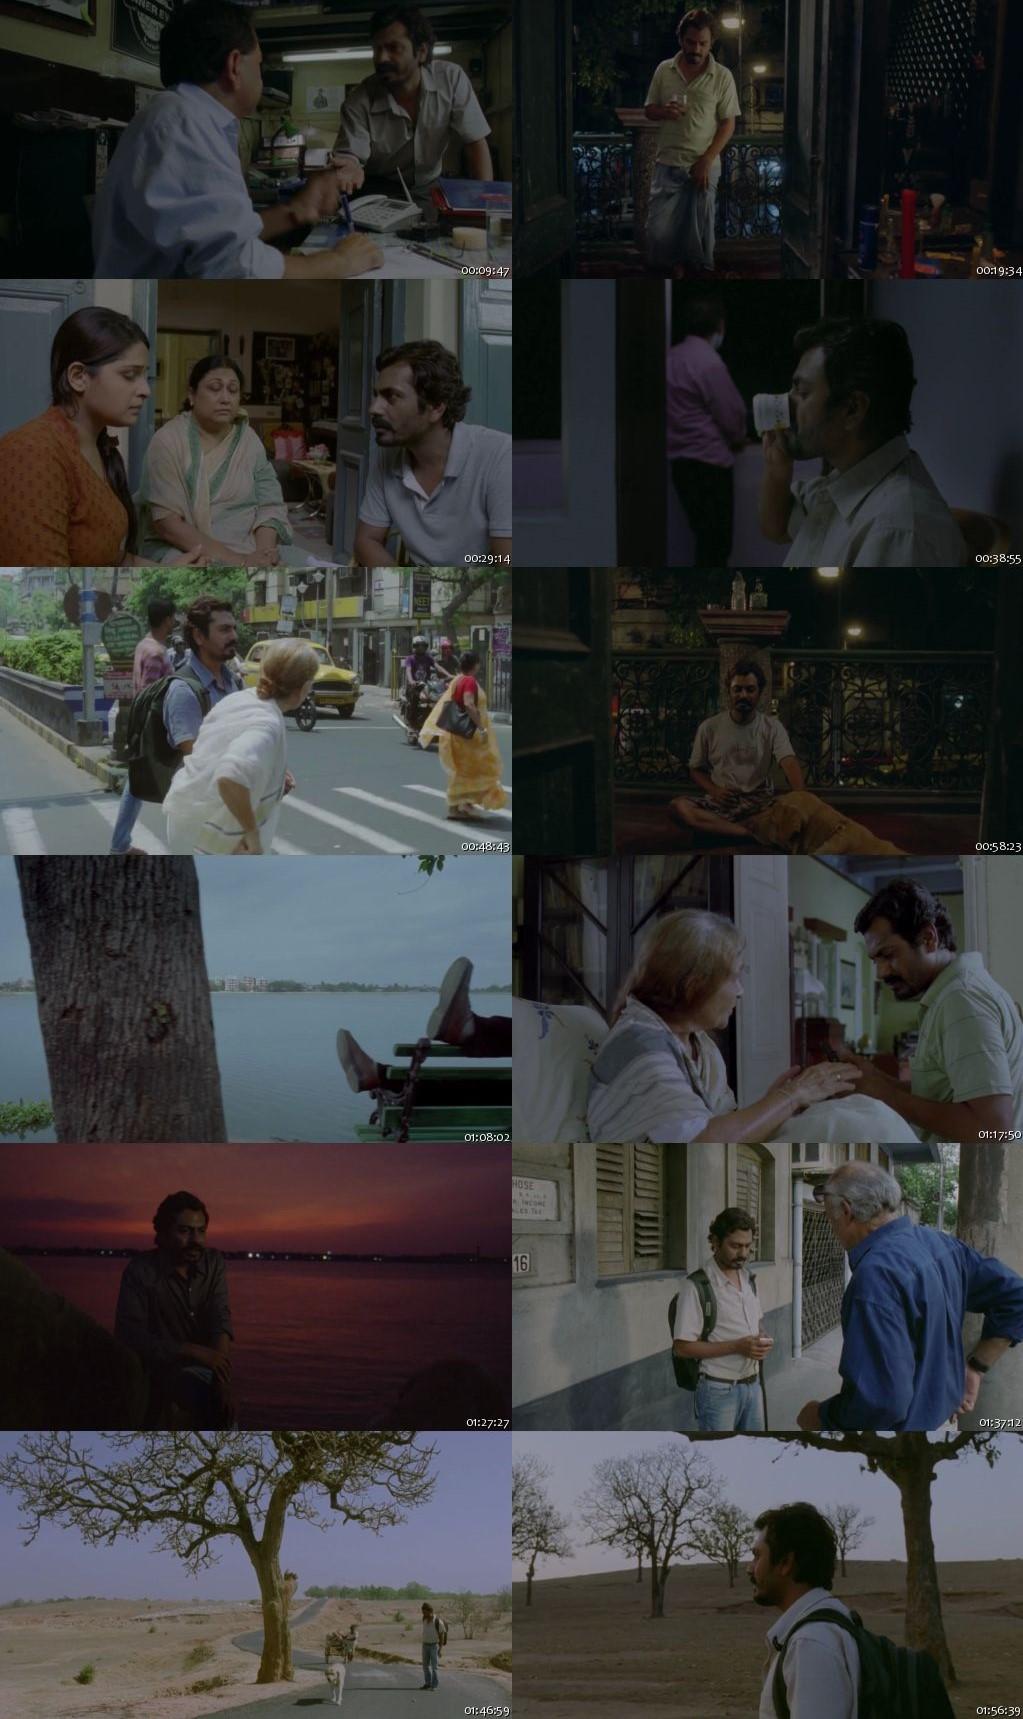 Anwar Ka Ajab Kissa 2020 Full Hindi Movie Online Watch